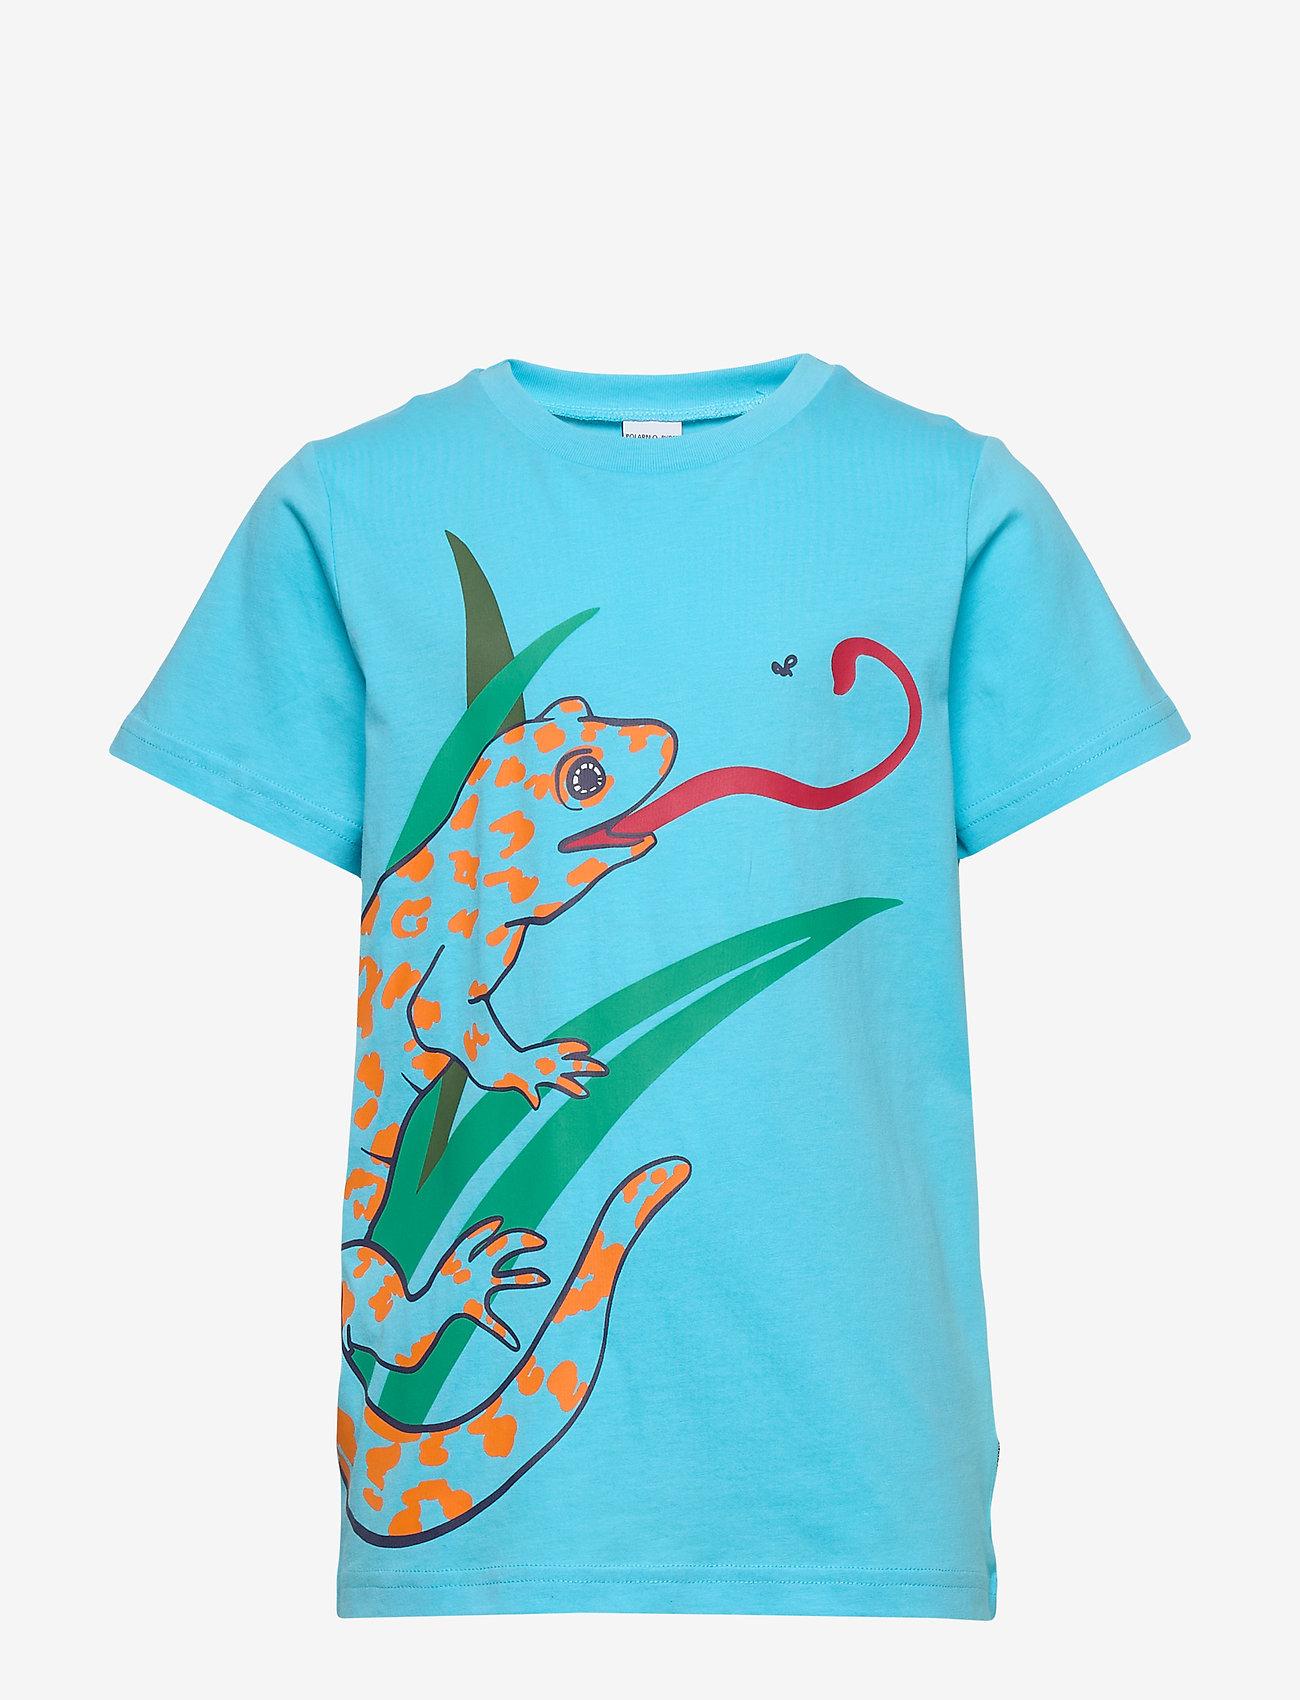 Polarn O. Pyret - T-shirt frontprint s/s School - lyhythihaiset - bachelor button